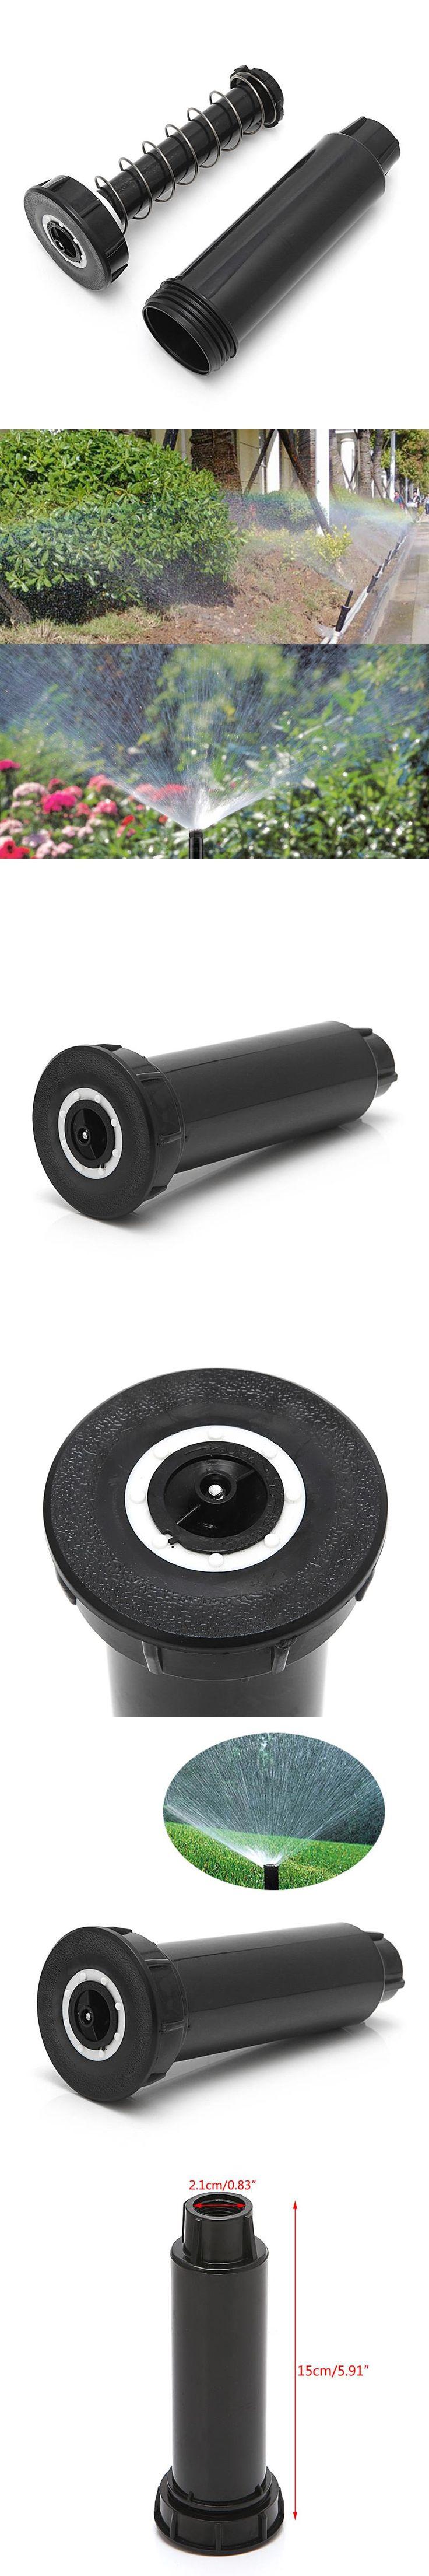 "New 1/2"" Adjustable Plastic Pop up Sprinklers 25-360 degree Lawn Irrigation Watering"